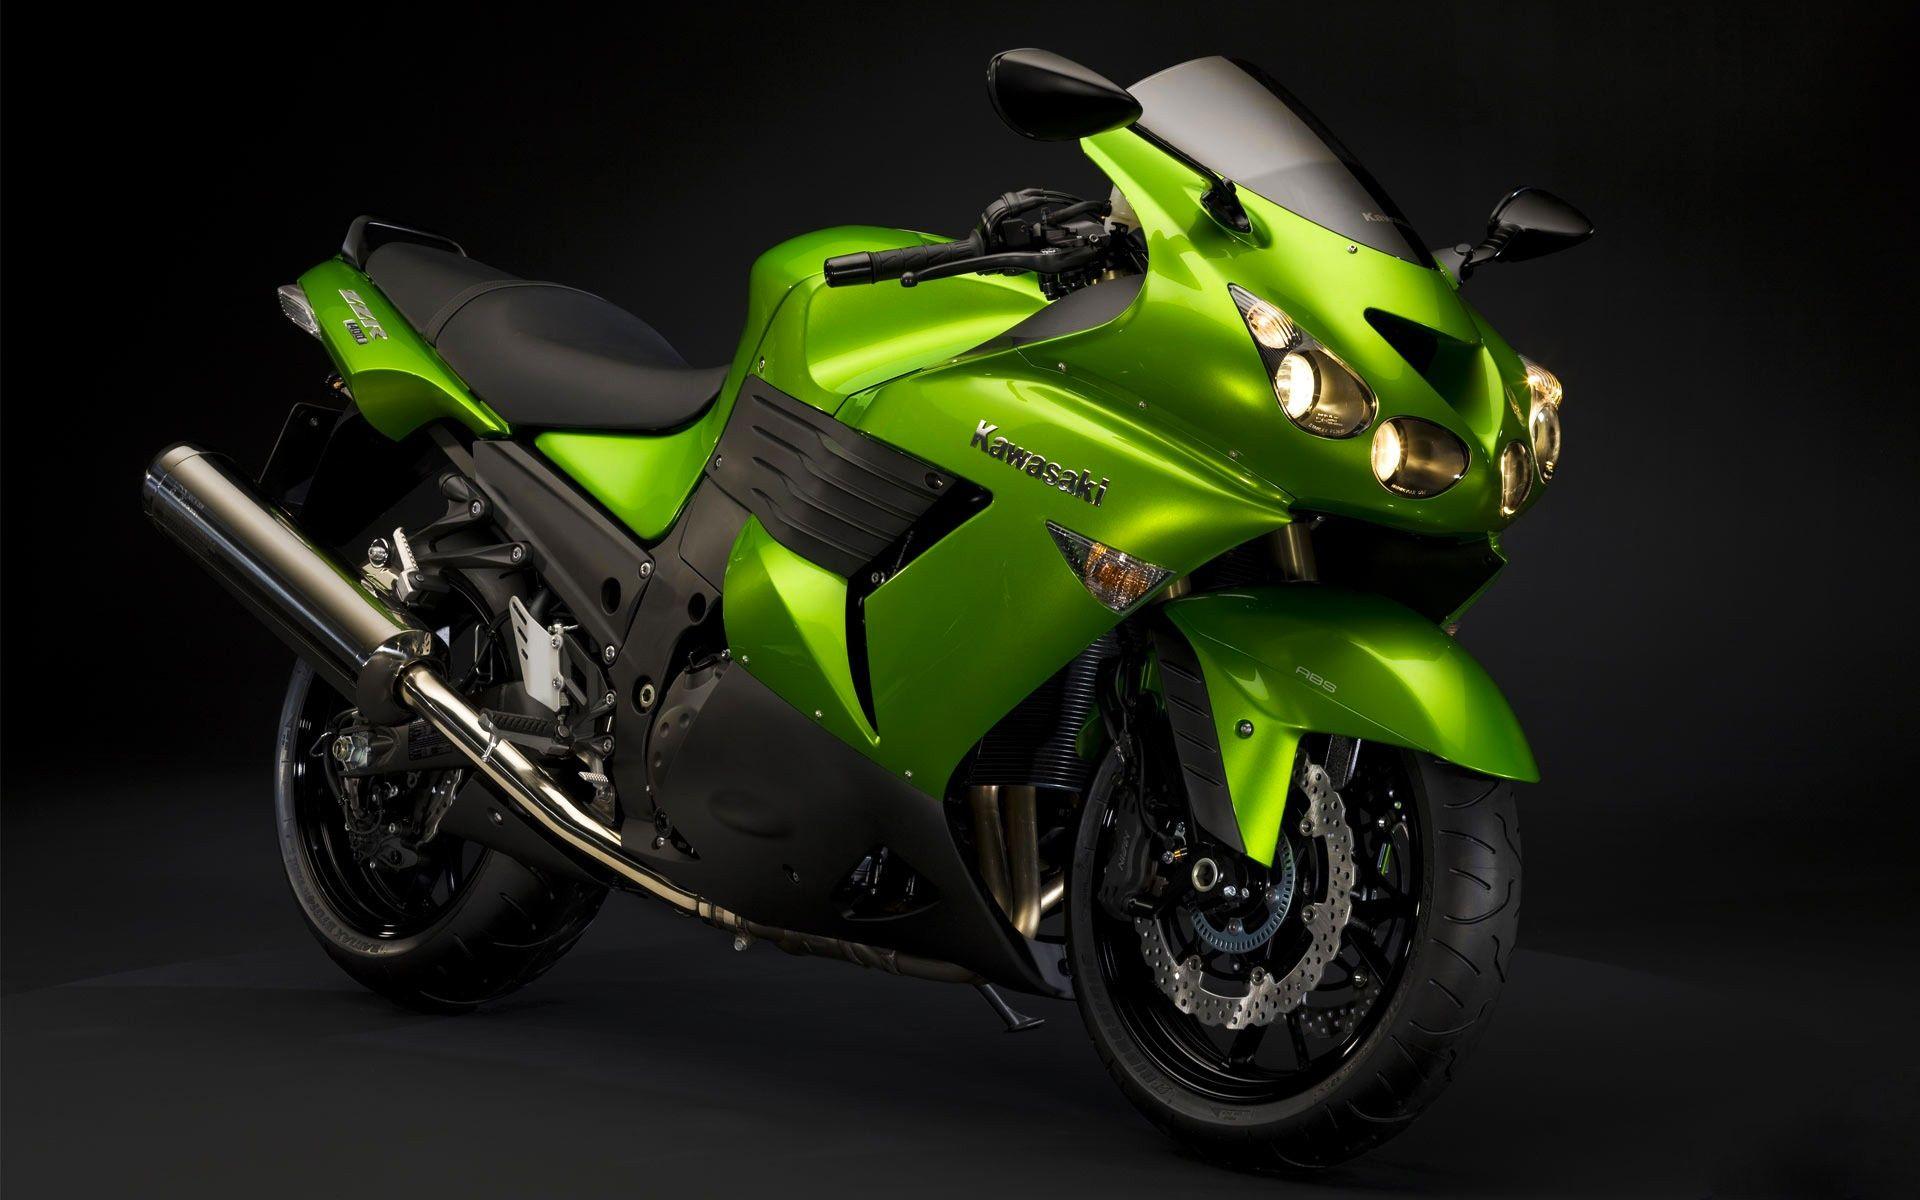 The Green Arrow S Ride Motorcycle Wallpaper Widescreen Wallpaper Super Bikes